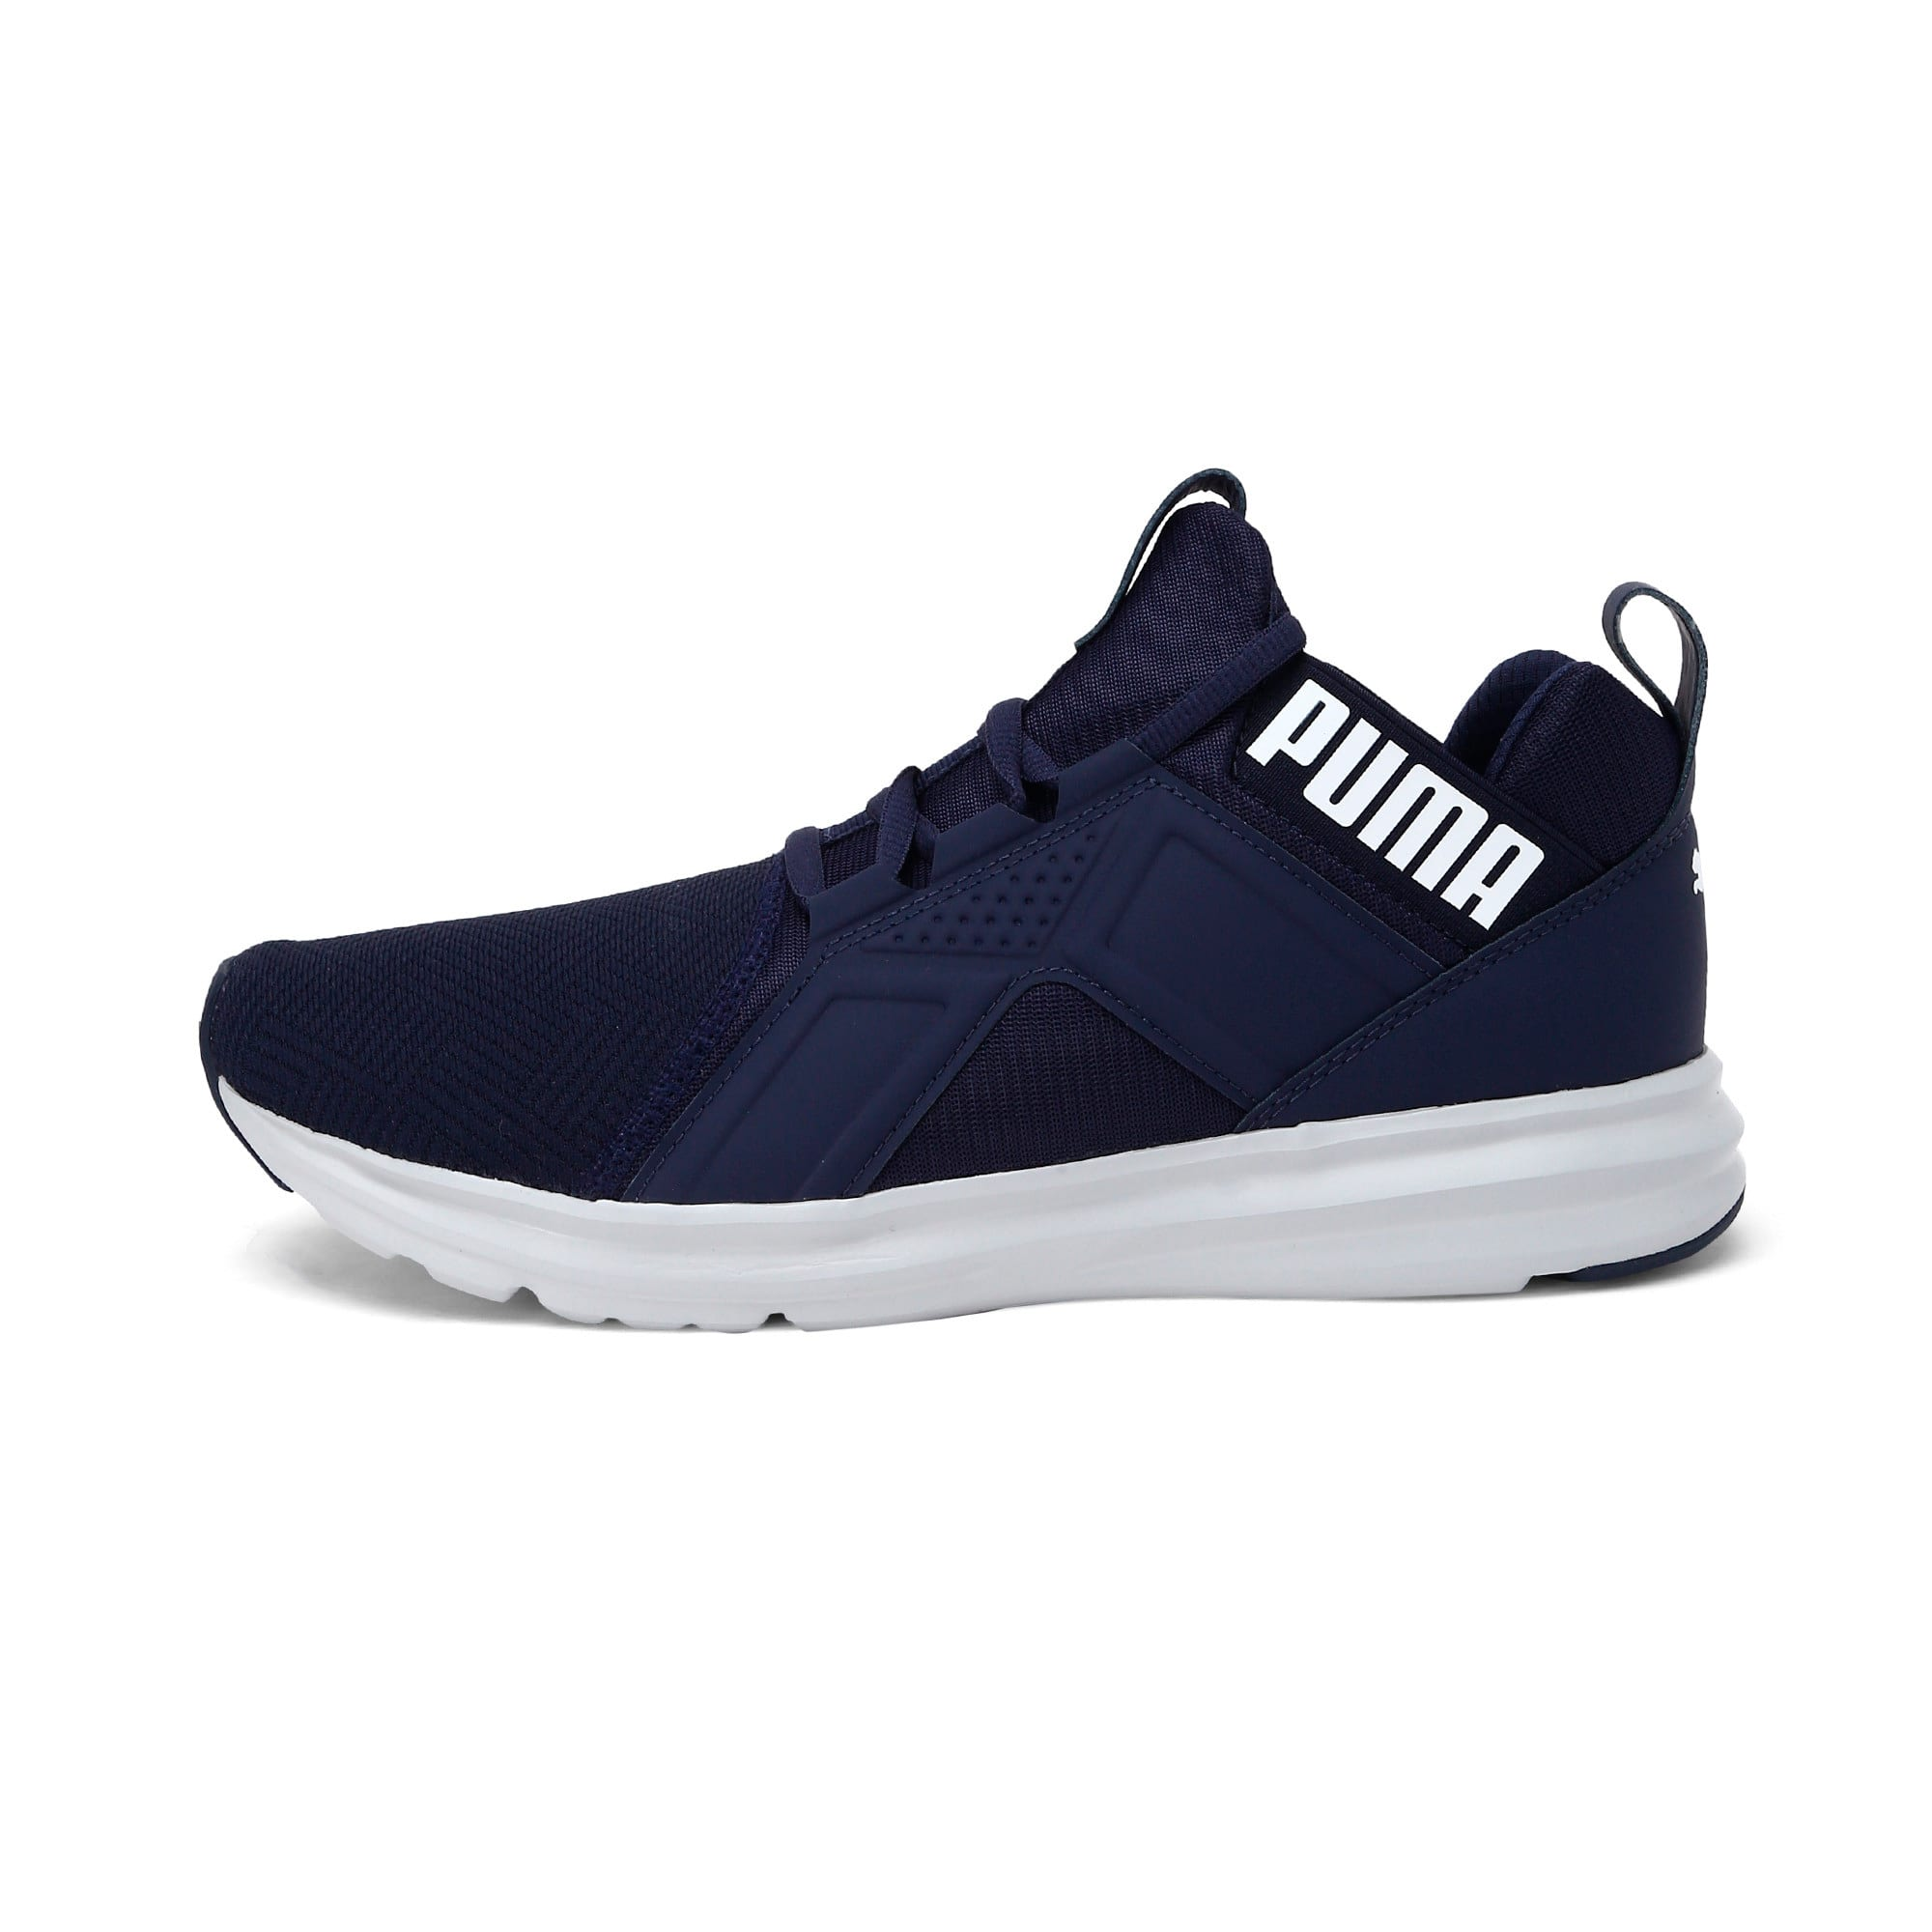 Thumbnail 1 of Enzo Geo Men's Running Shoes, Peacoat, medium-IND